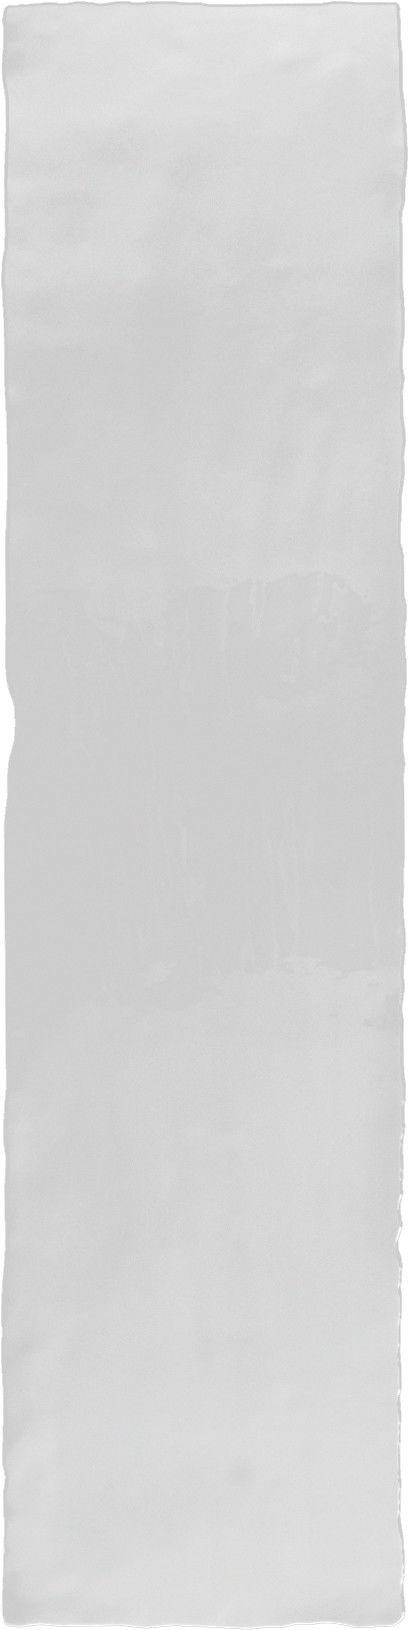 WOW design Handmade Floor White 6,8x27,8 cegła